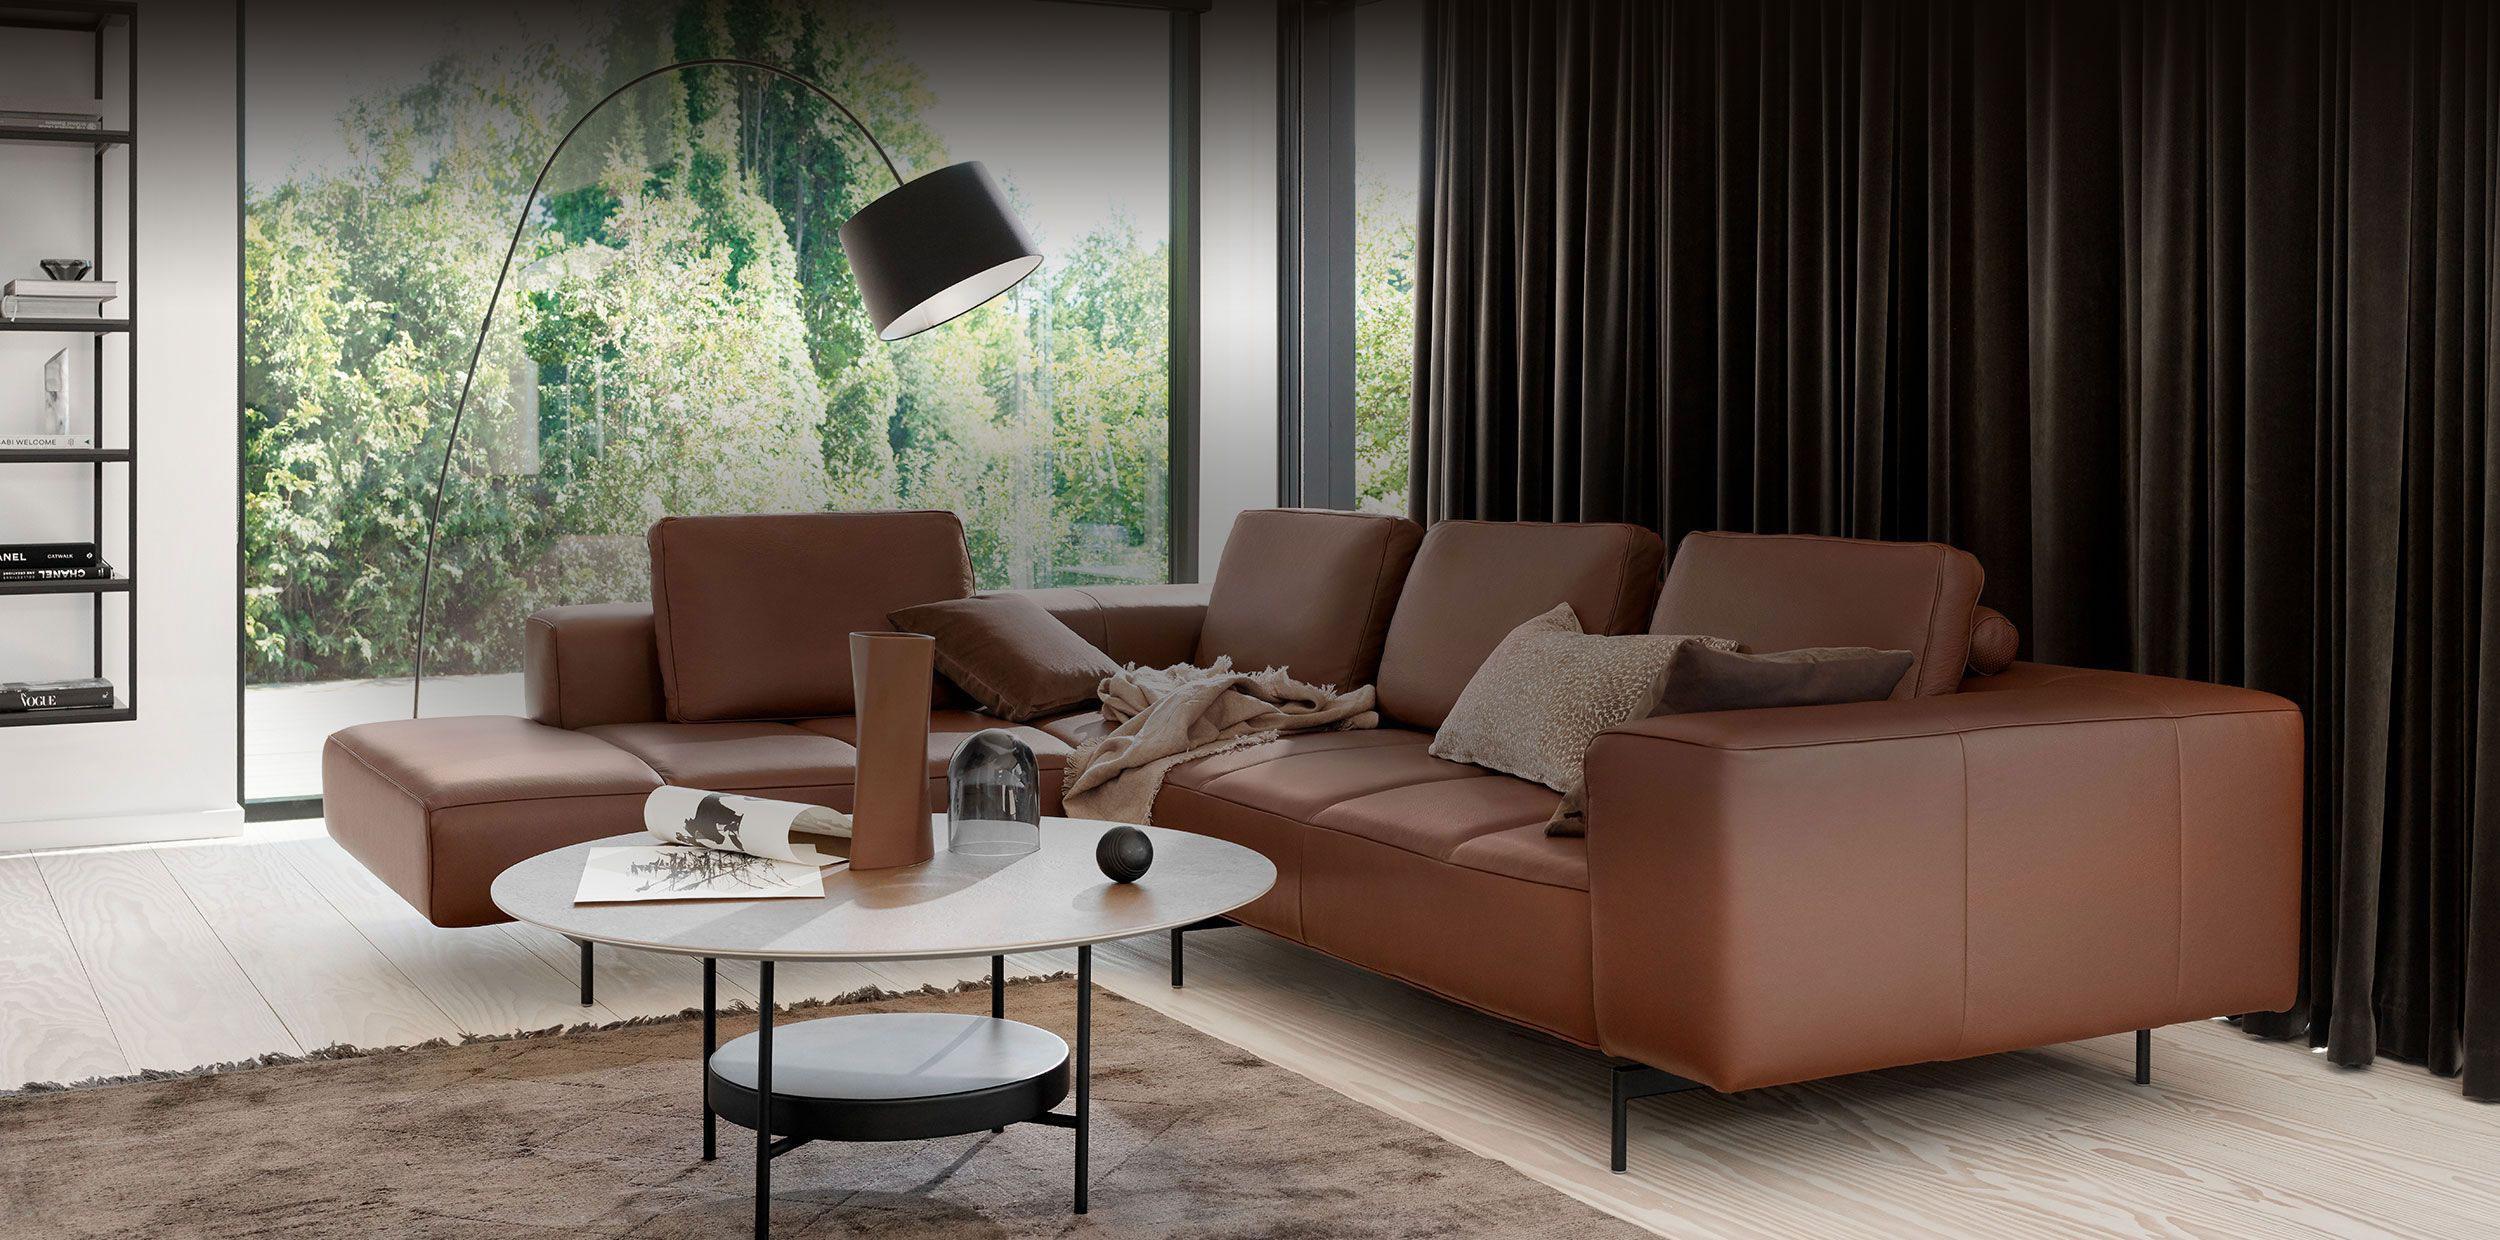 sofa shops glasgow city centre bed ebay australia modern contemporary furniture design boconcept we love to help